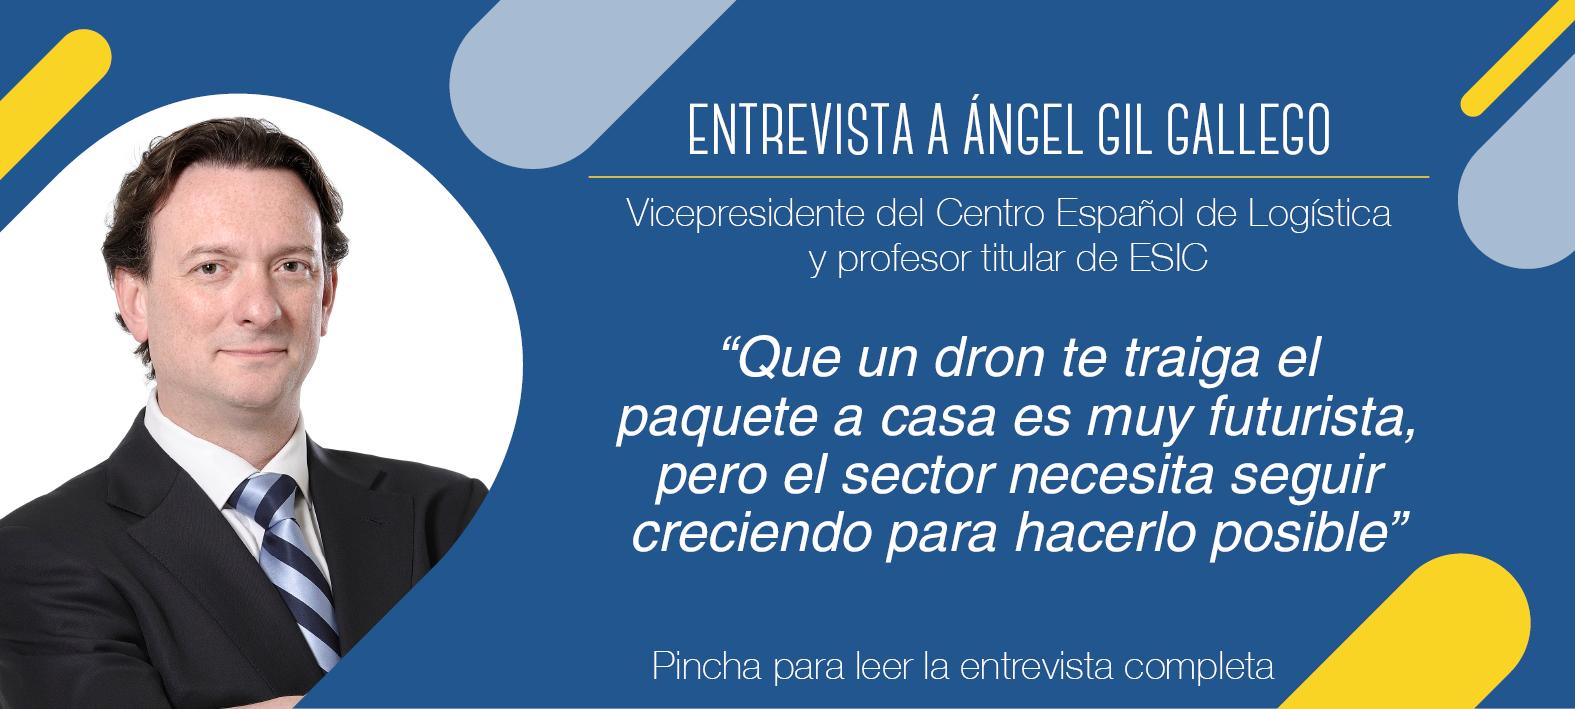 Entrevista Angel Gil